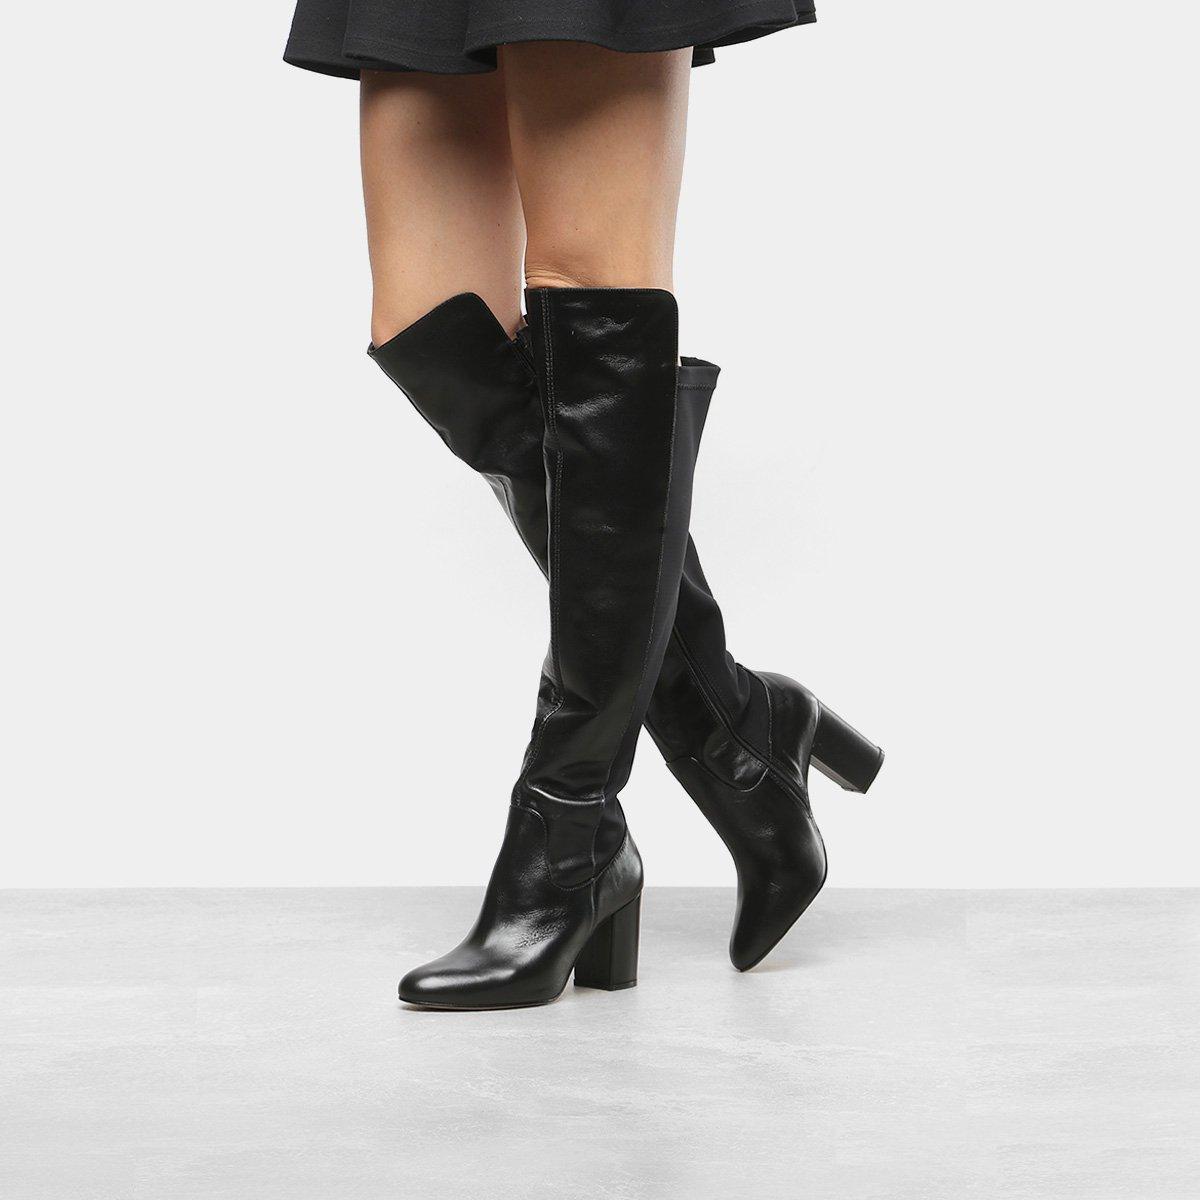 8134bd843 Bota Couro Over The Knee Shoestock Neoprene Feminina | Shoestock